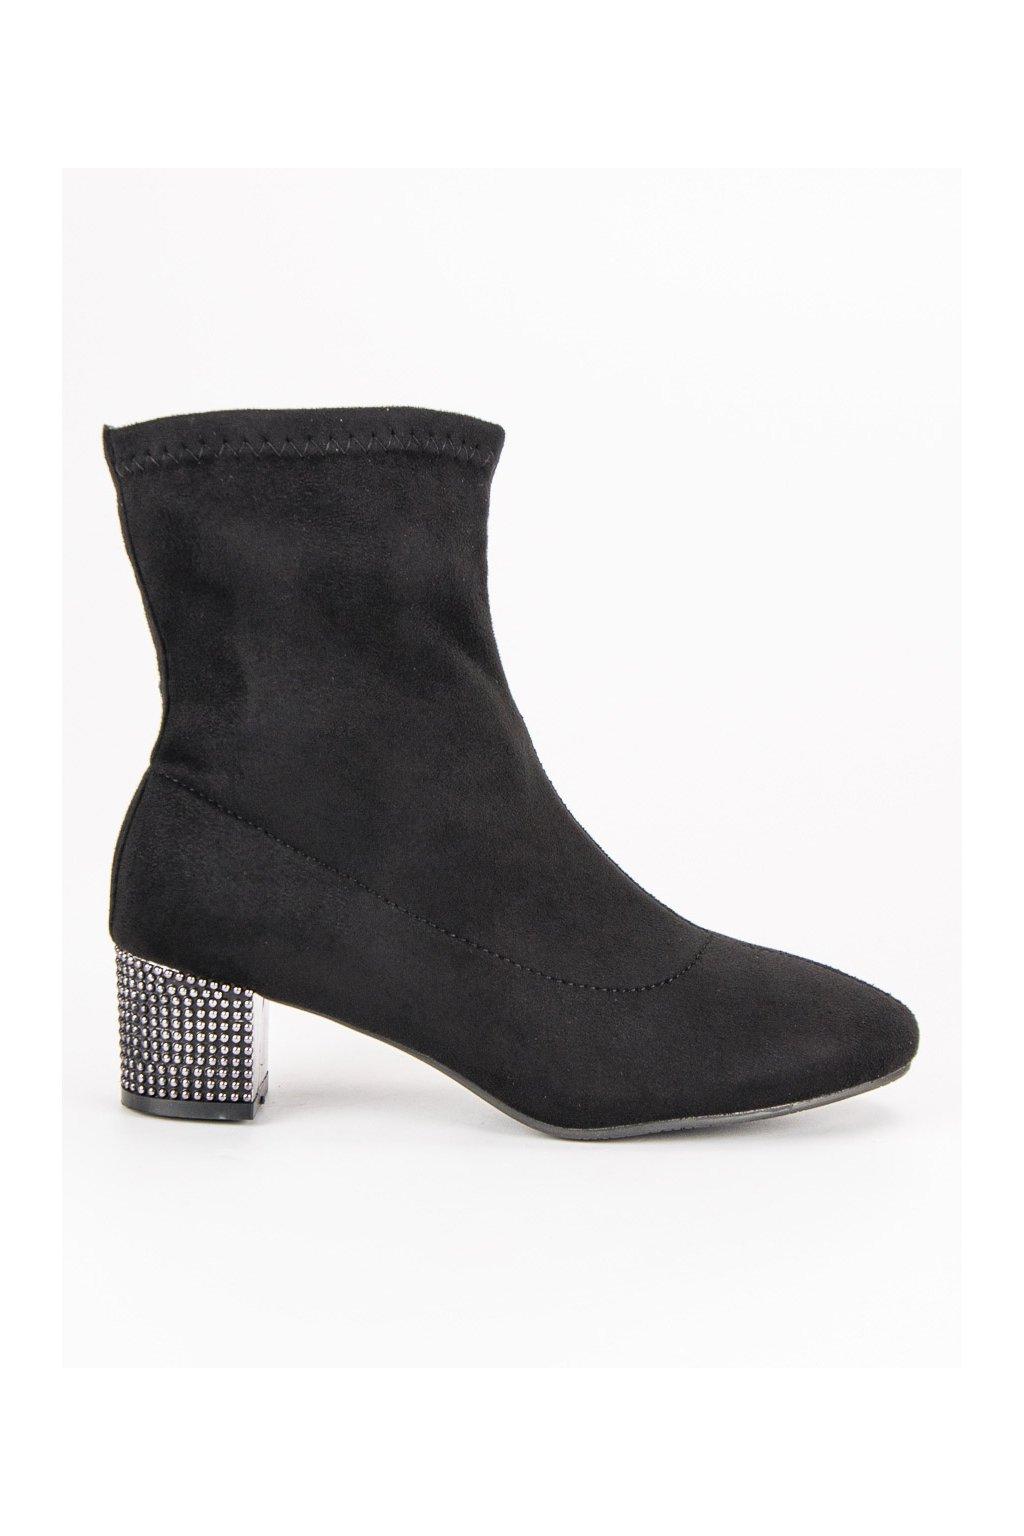 Dámske čierne nazúvacie topánky s ozdobenou pätou Kylie